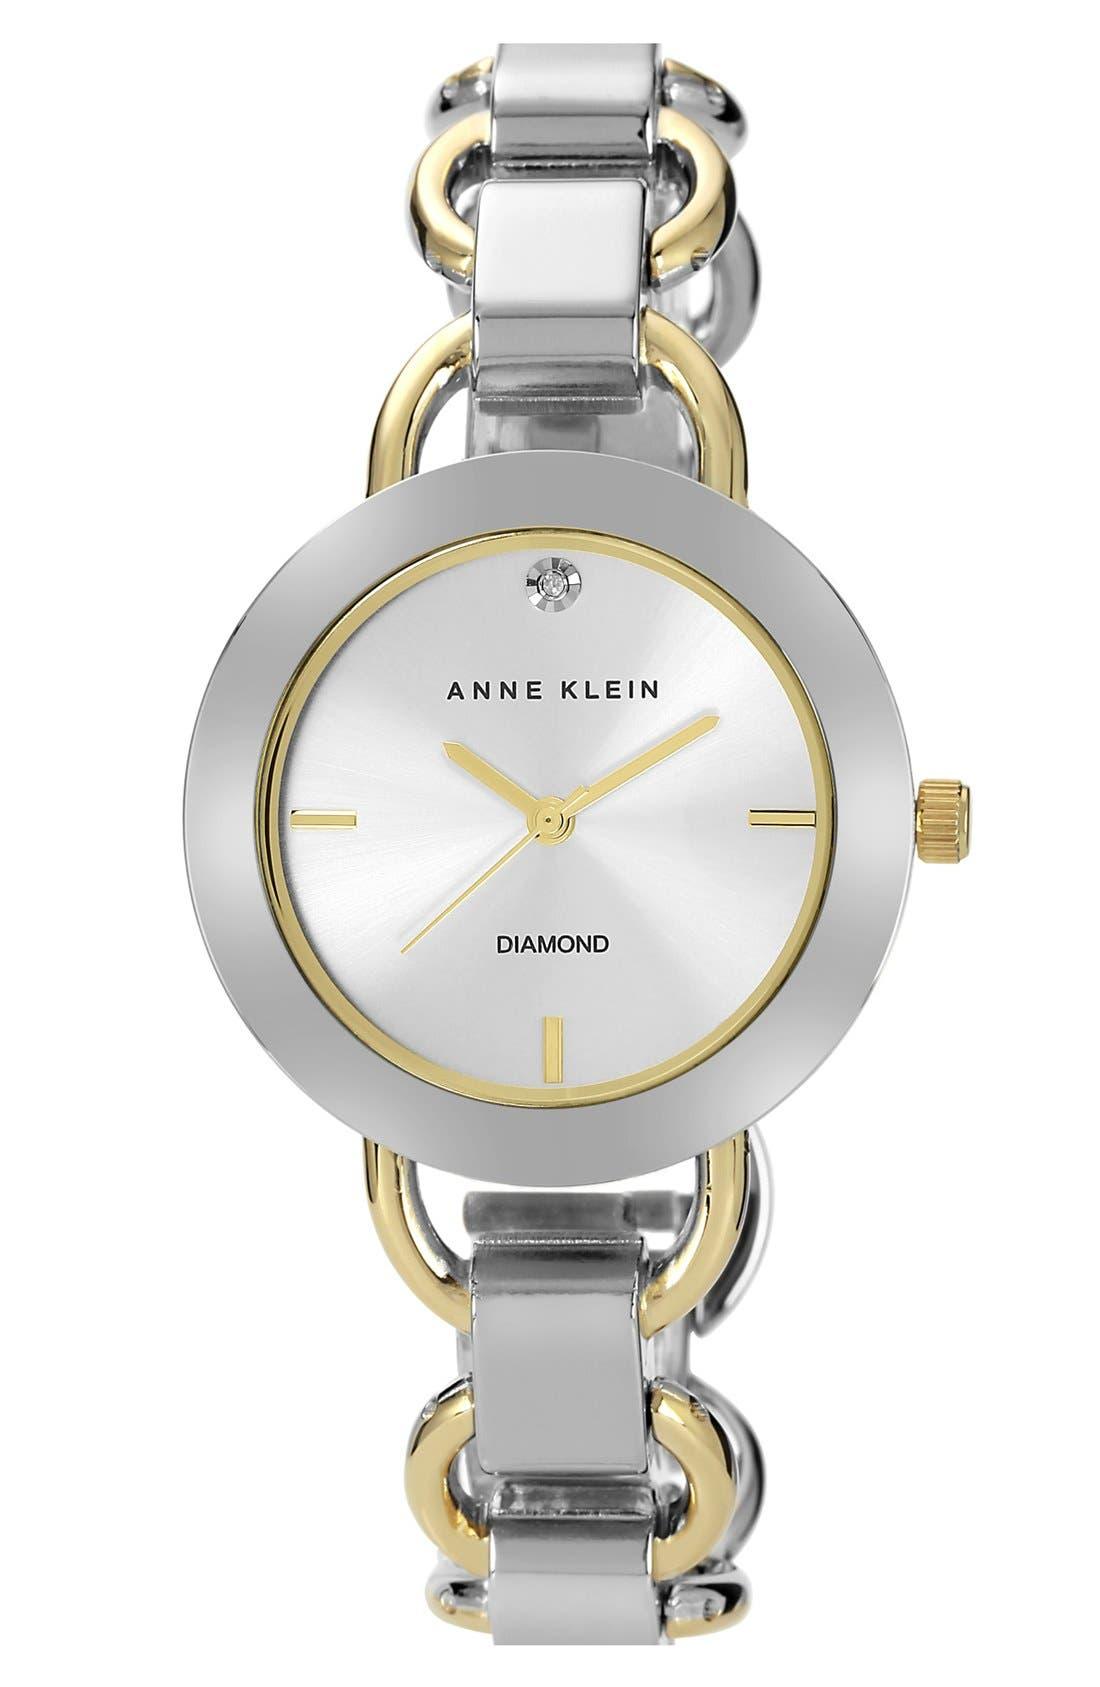 Main Image - Anne Klein Diamond Dial Bracelet Watch, 34mm